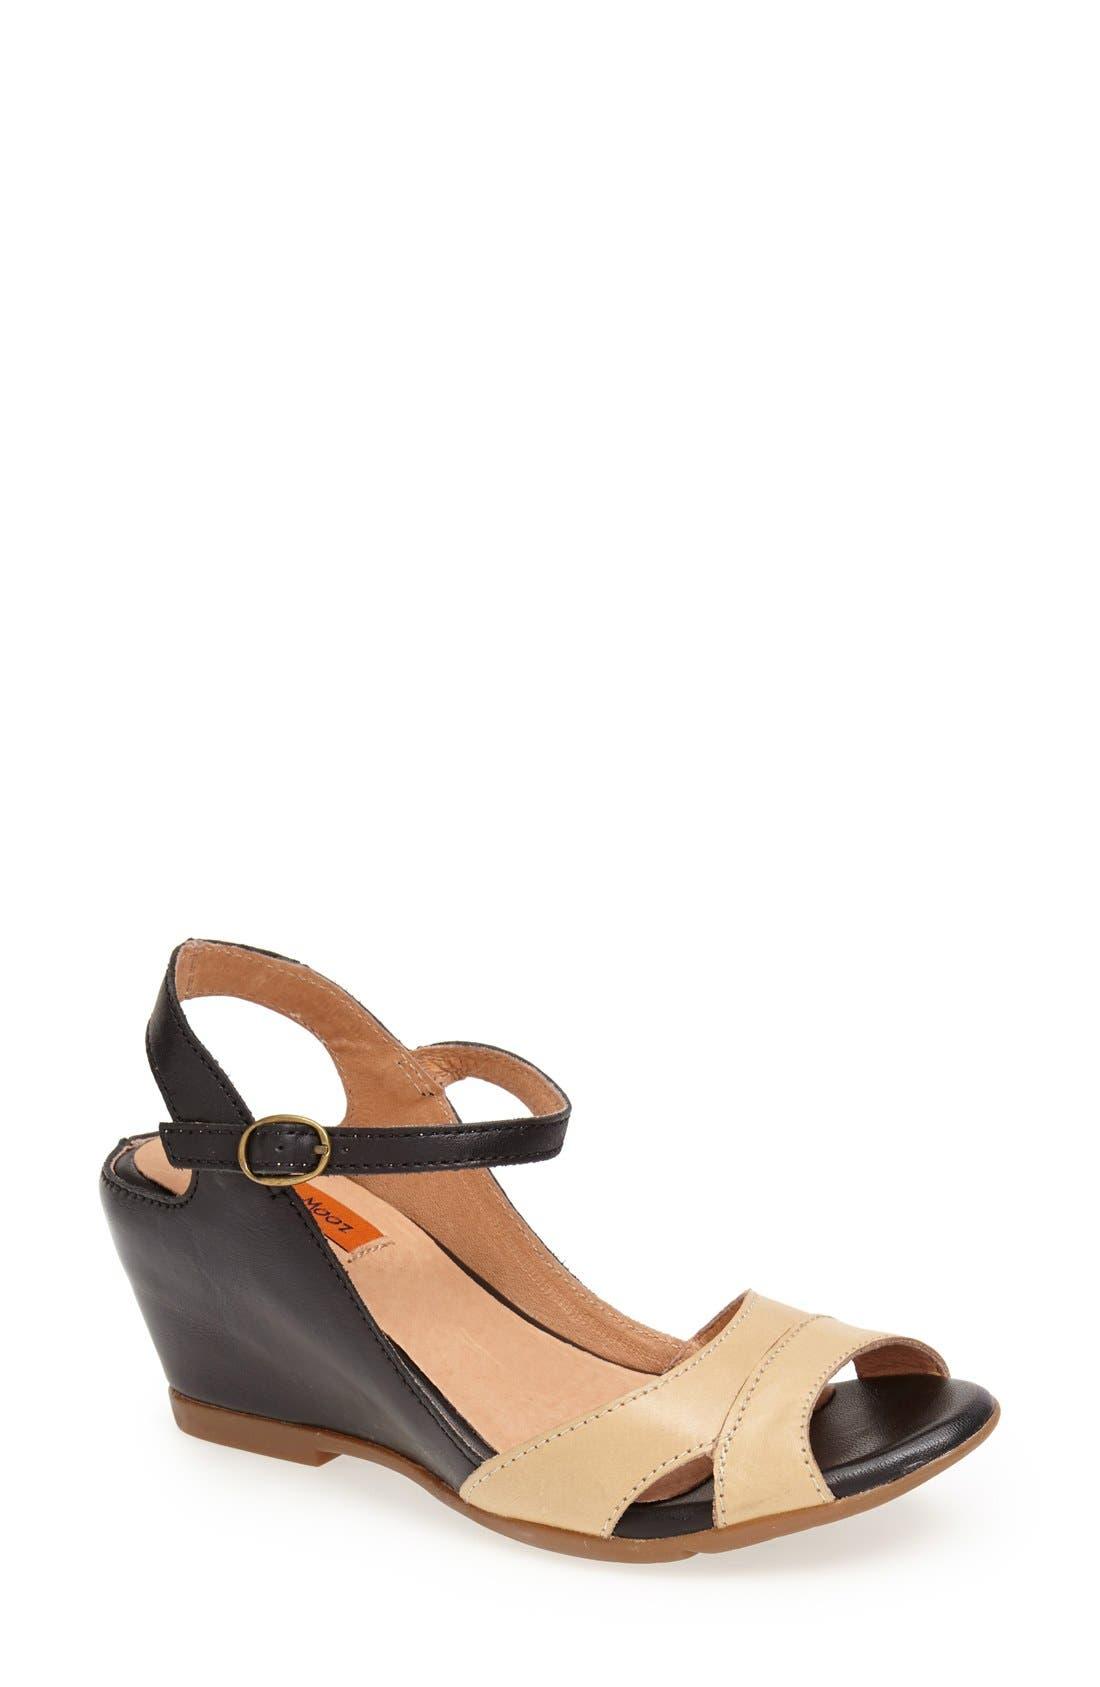 Main Image - Miz Mooz Footwear 'Cosette' Wedge Sandal (Women)